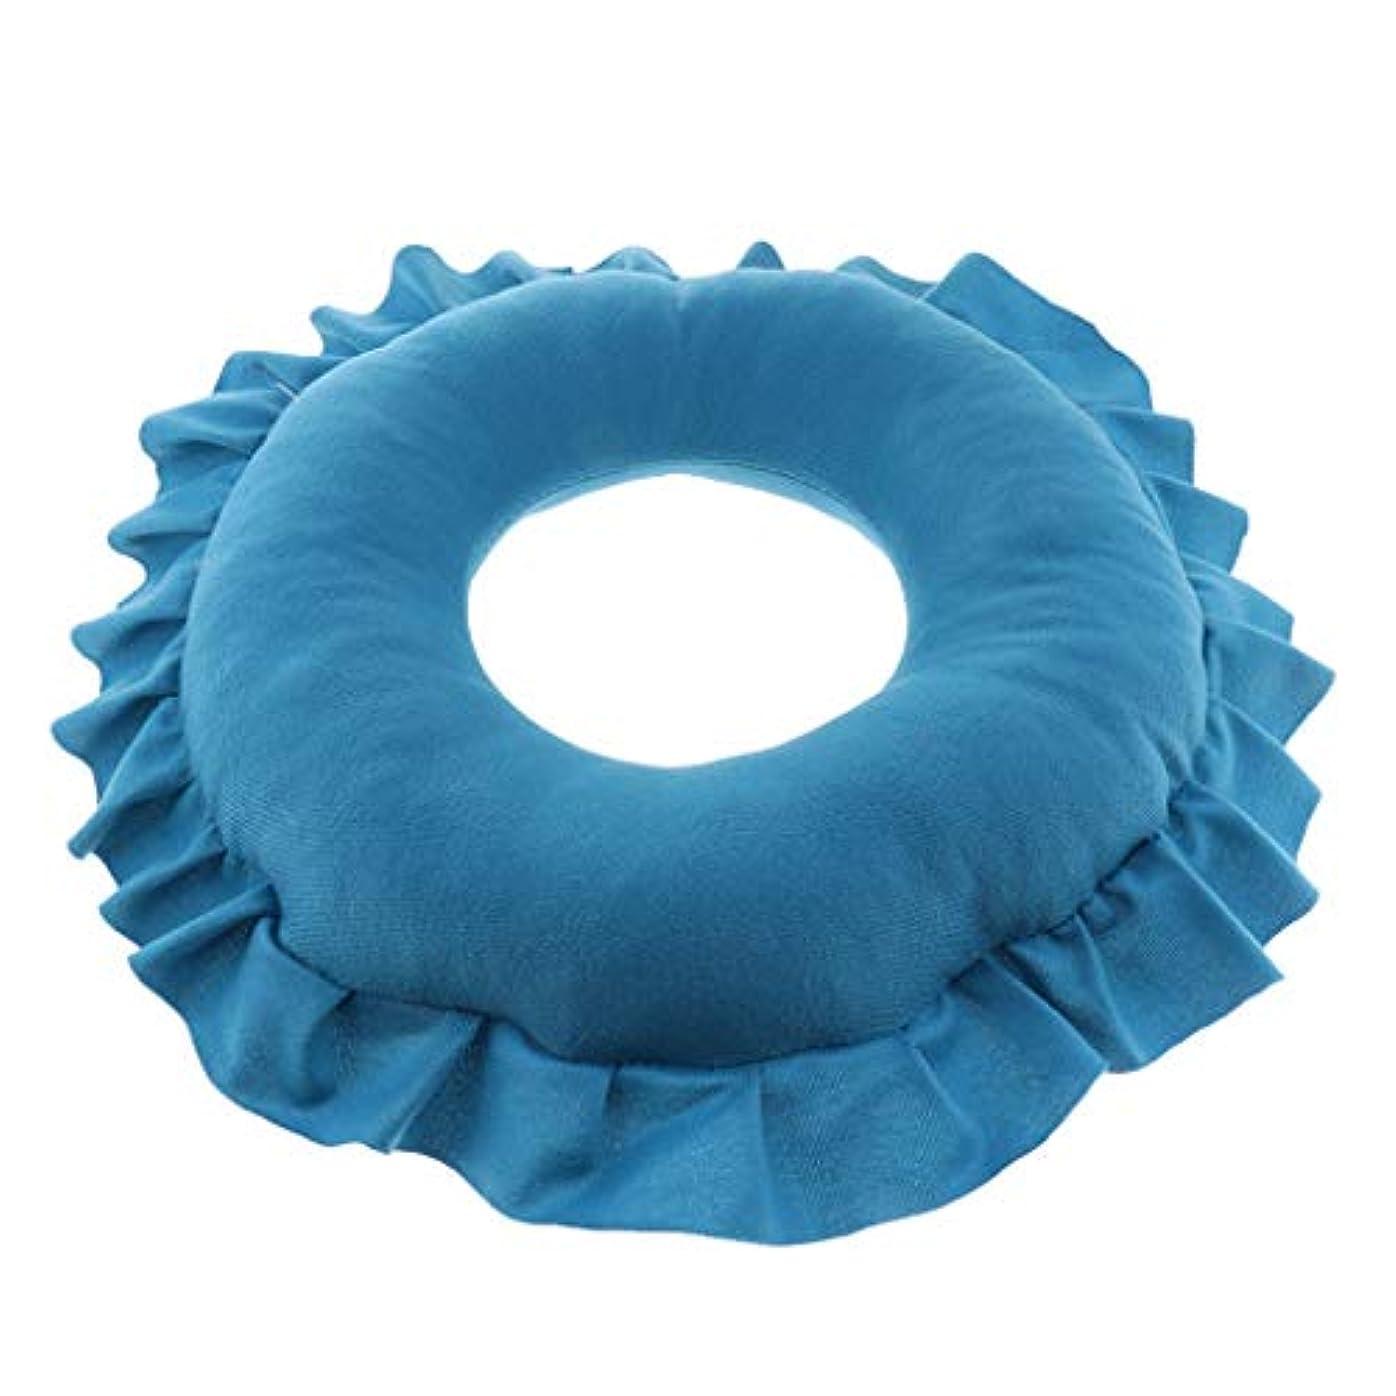 P Prettyia 顔マク フェイスマット マッサージ枕 顔枕 ラウンド 直径30cm 洗える 柔らかい 快適 全4色 - 青